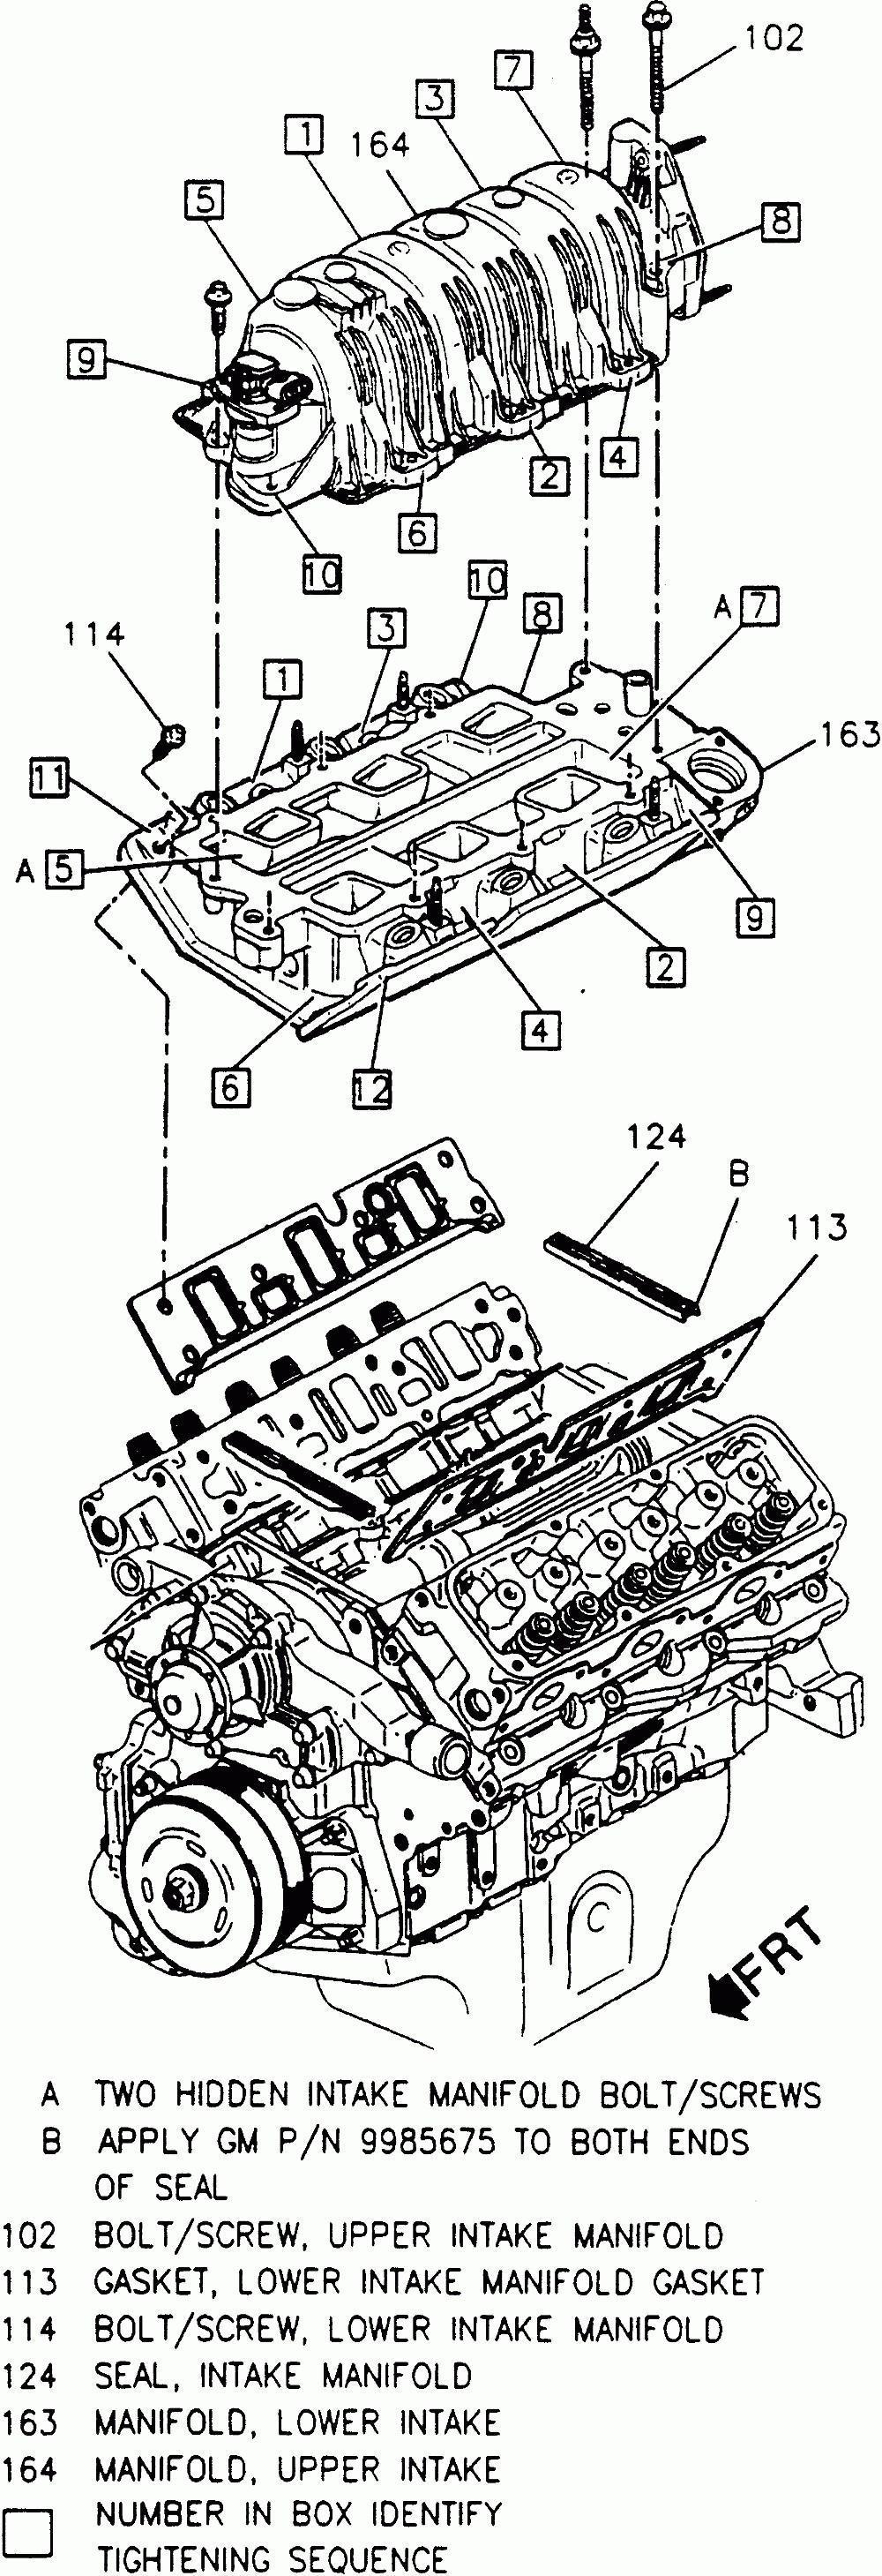 8 Cylinder Engine Diagram Gm 3800 Engine Diagram Layout Wiring Diagrams • Of 8 Cylinder Engine Diagram